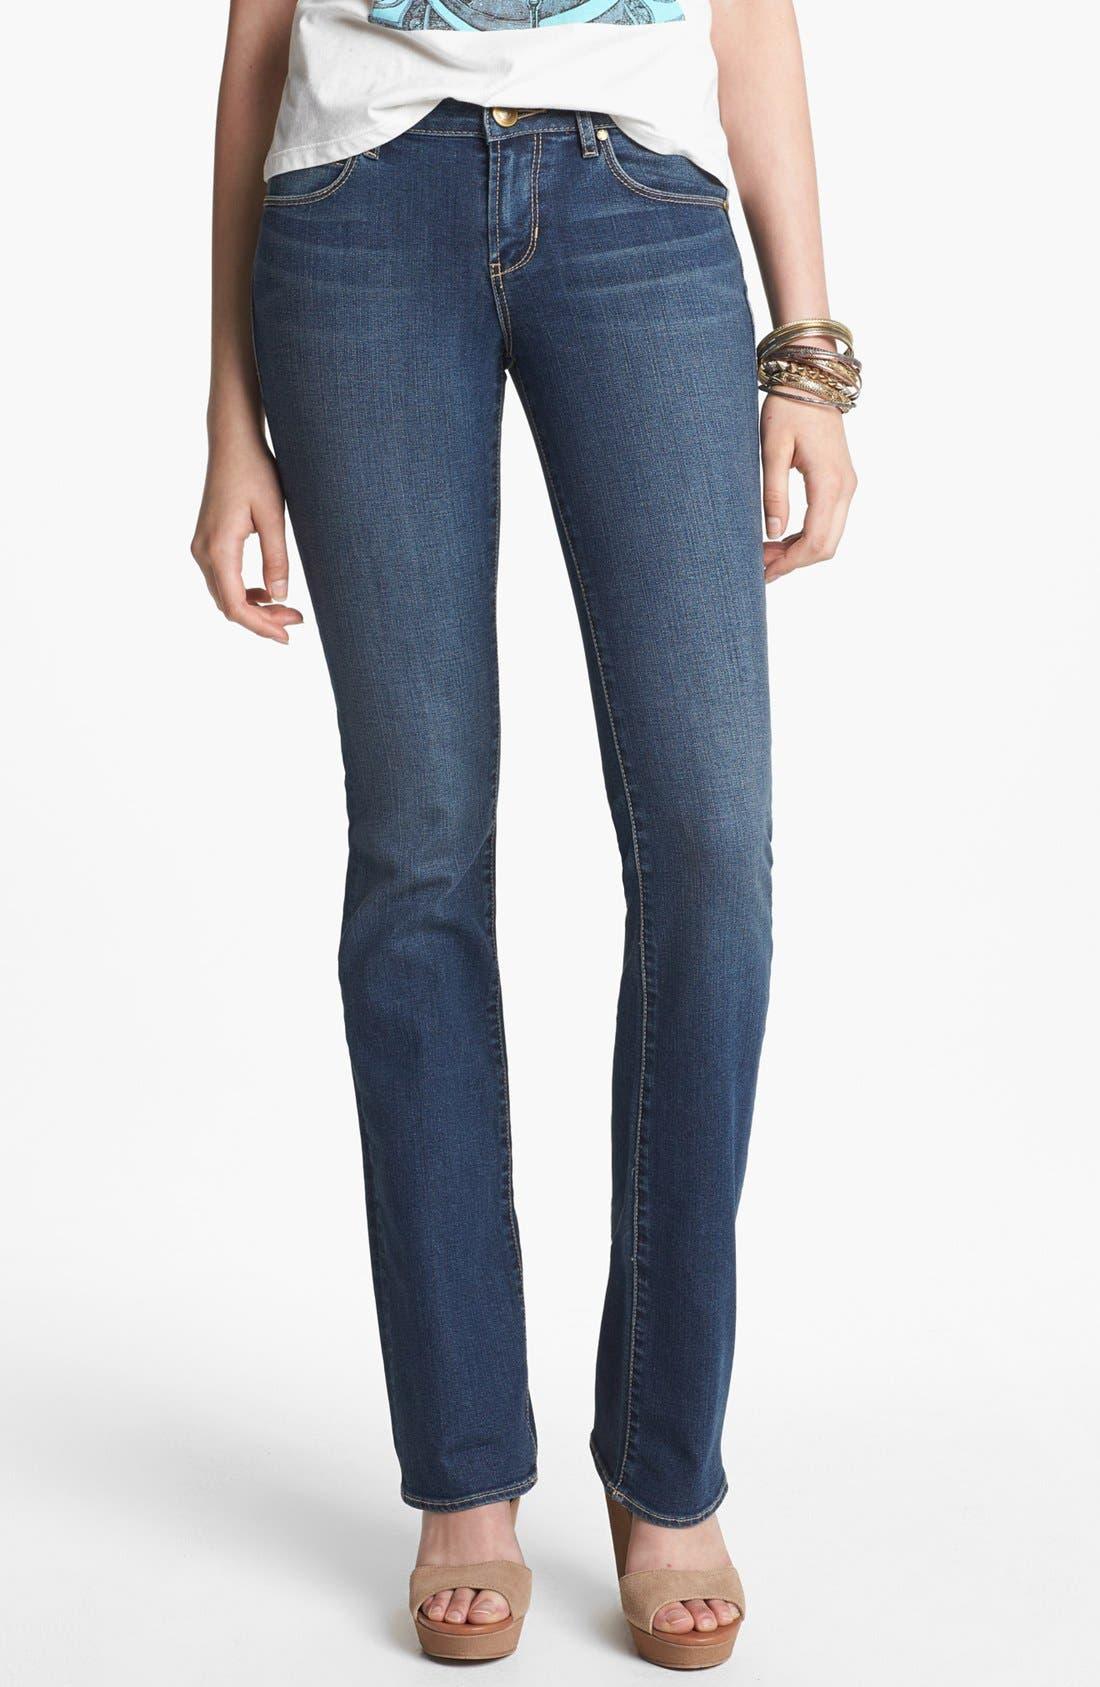 Main Image - Articles of Society 'Kendra' Baby Bootcut Jeans (Medium) (Juniors)